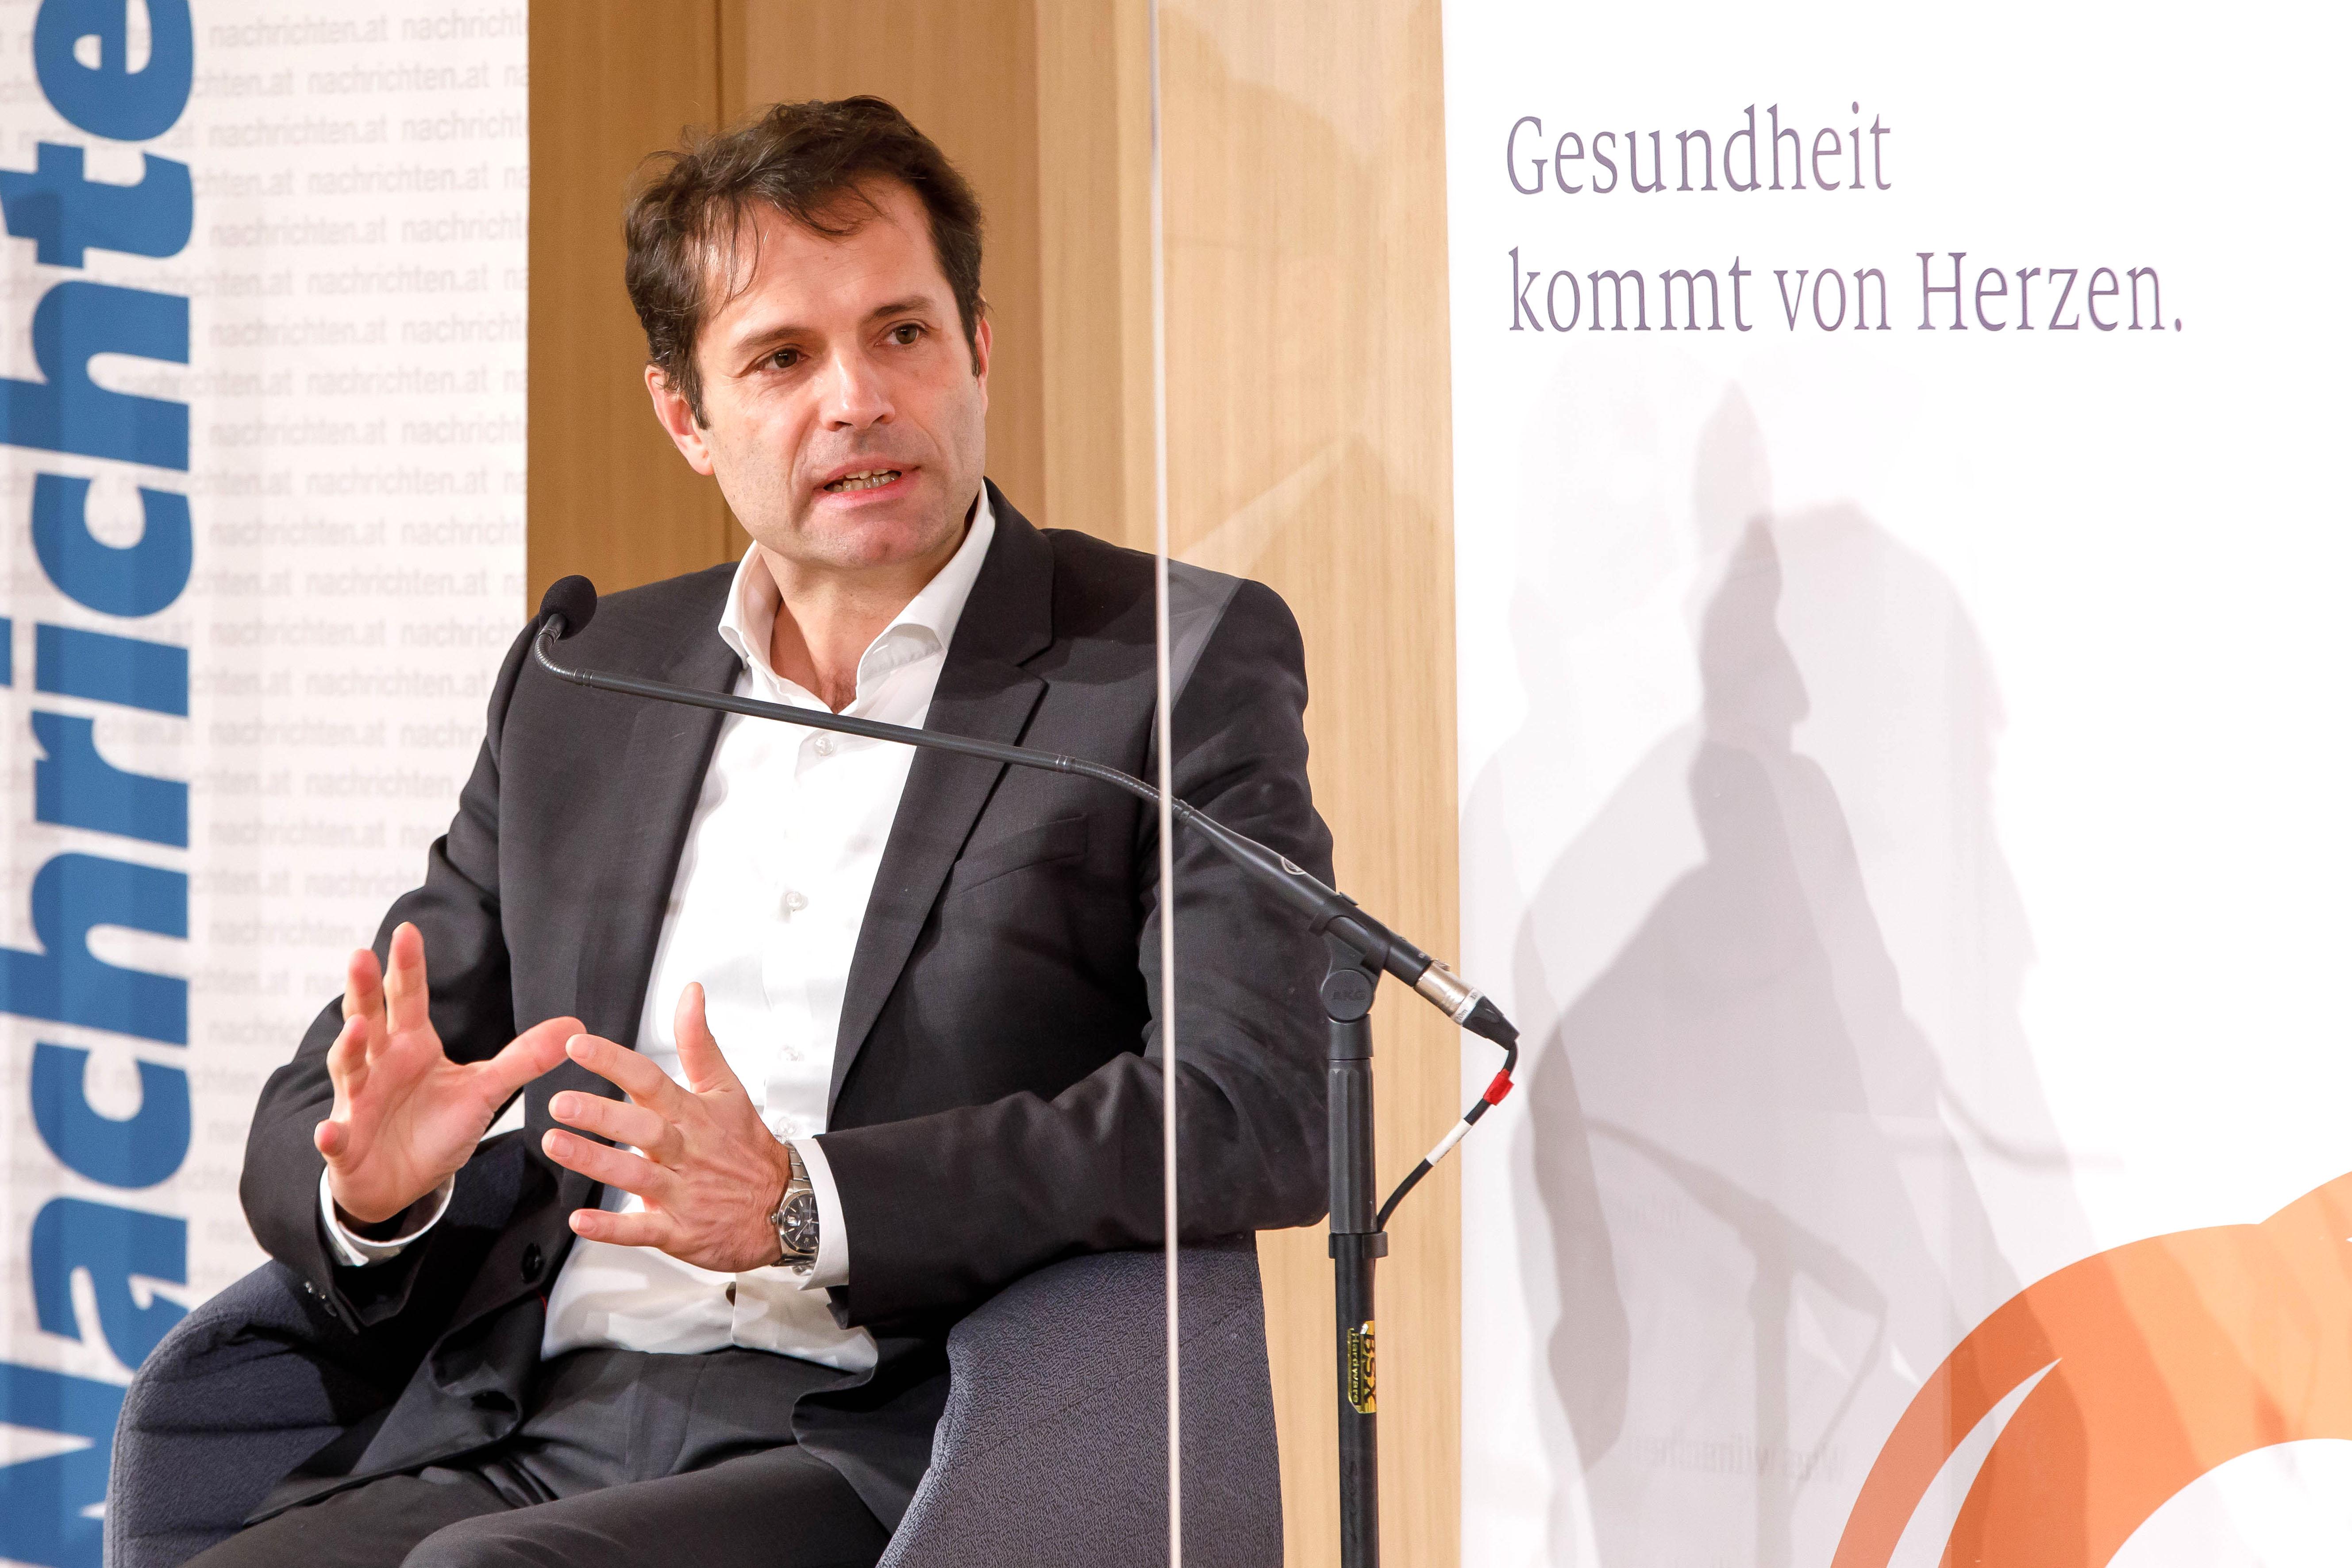 Foto 3: Dr. Michael Heinisch, Geschäftsführer Vinzenz Gruppe